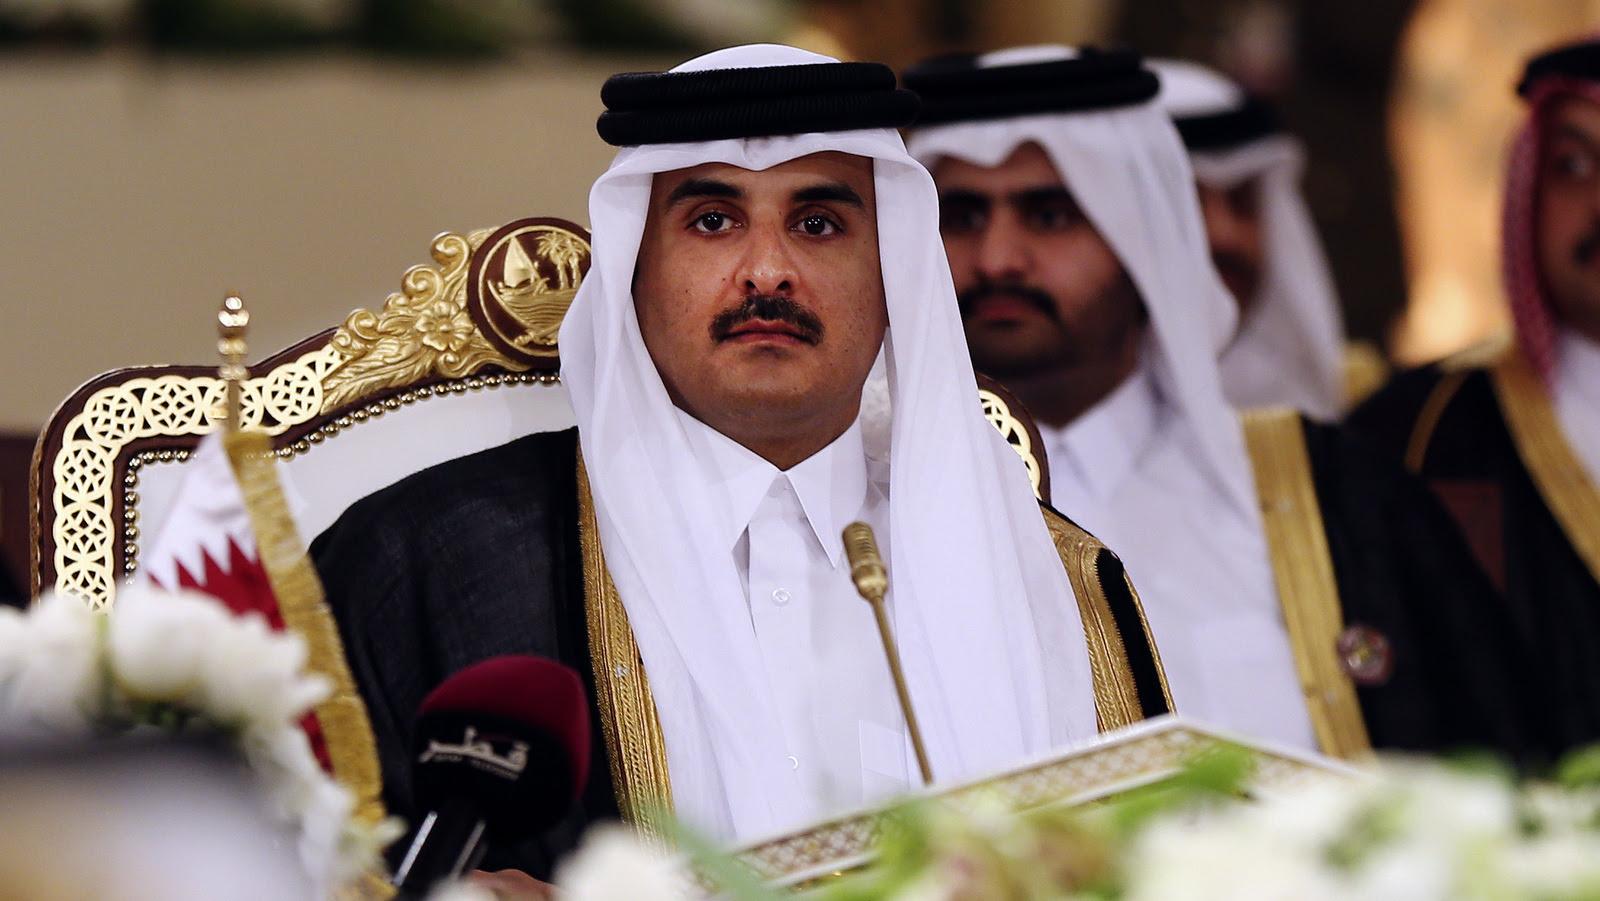 Qatar's Emir Sheikh Tamim bin Hamad Al-Thani attends a Gulf Cooperation Council summit in Doha, Qatar. (AP/Osama Faisal)